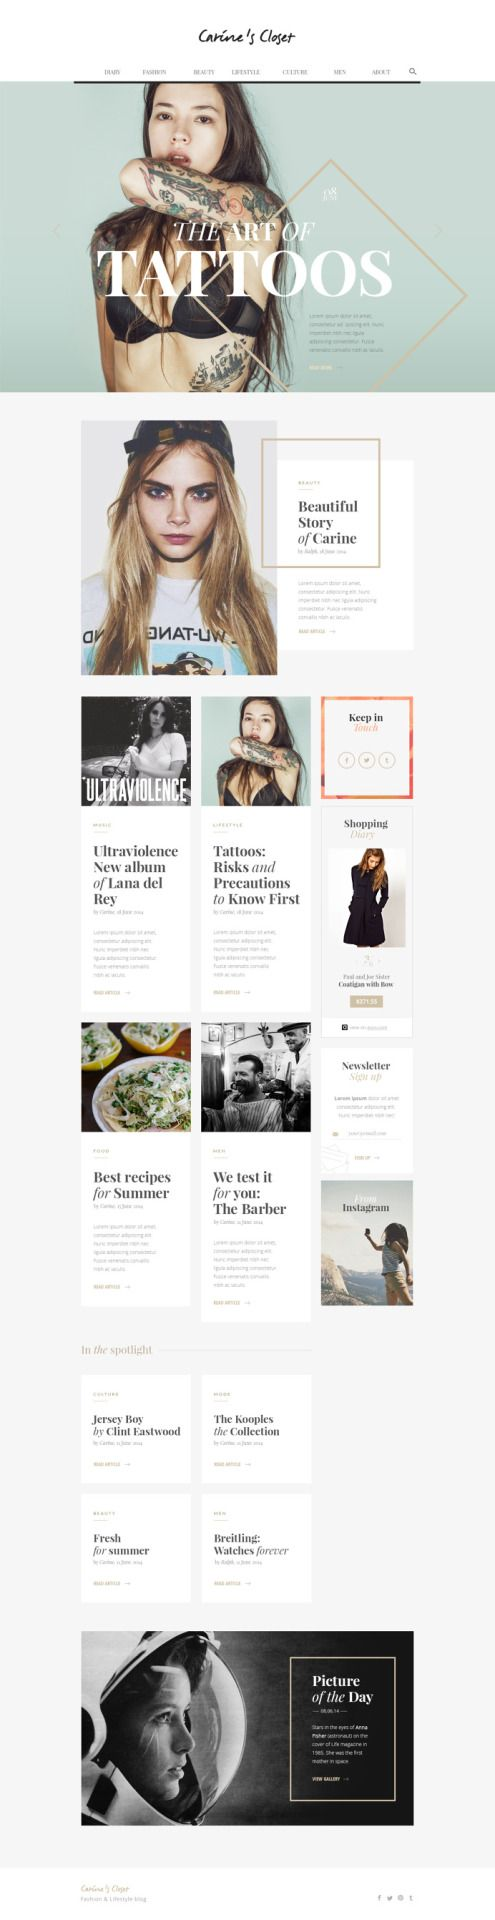 Slapdashing / Art and Design Inspiration Blog : Photo